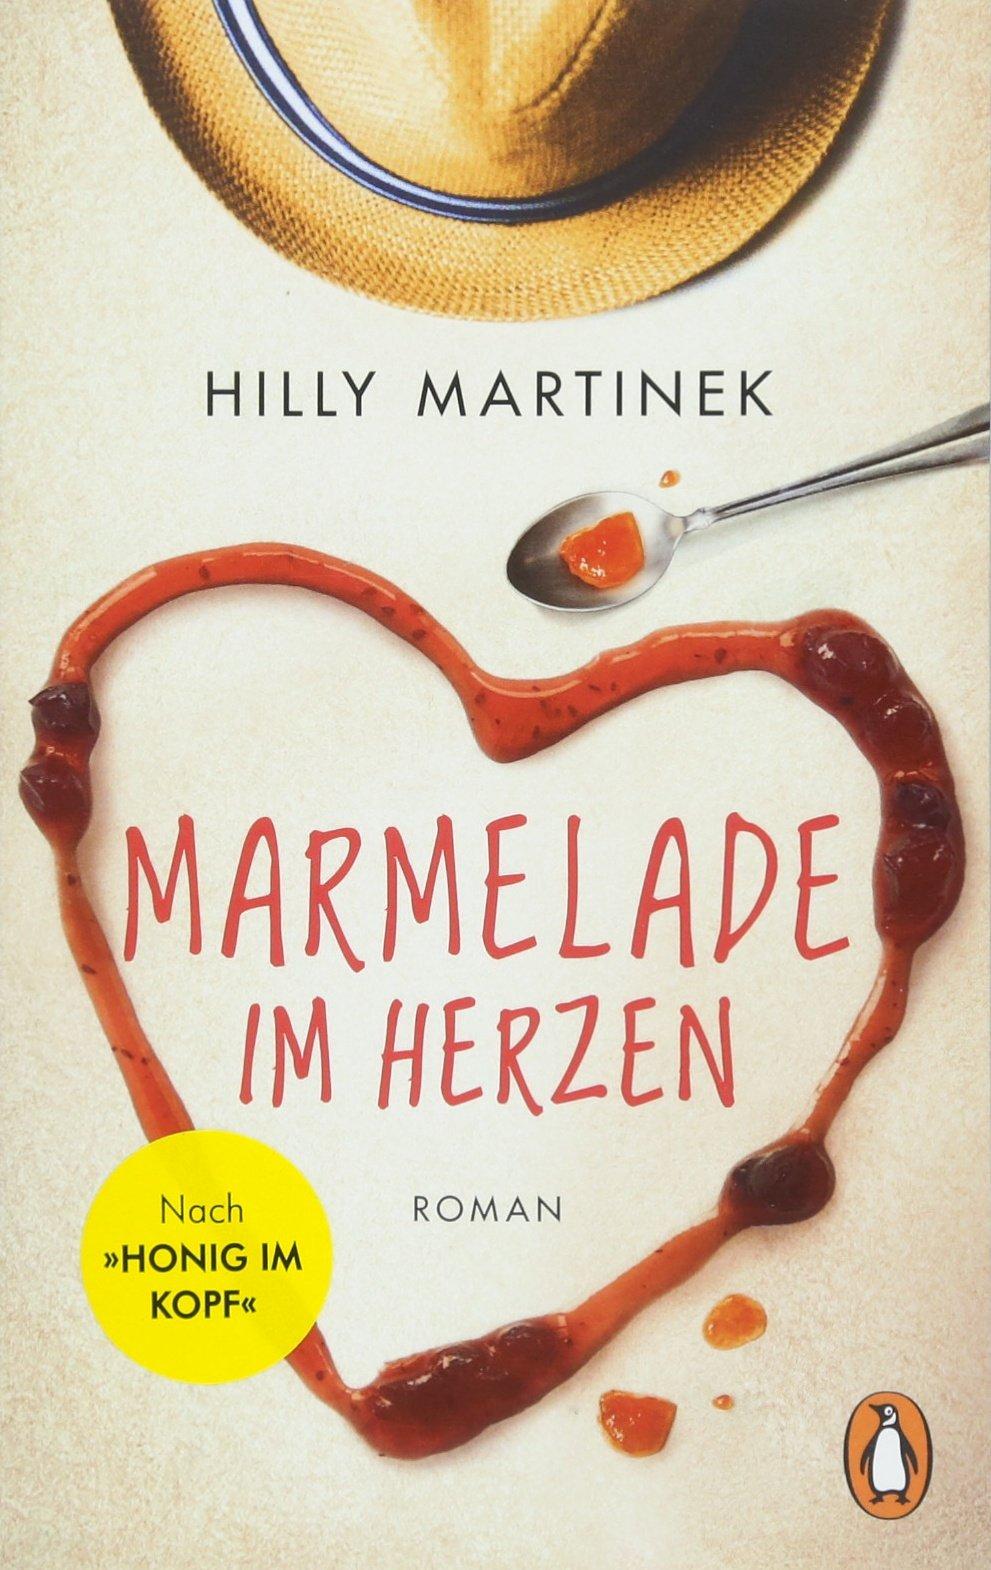 Marmelade im Herzen: Roman: Hilly Martinek: 9783328102588: Amazon ...